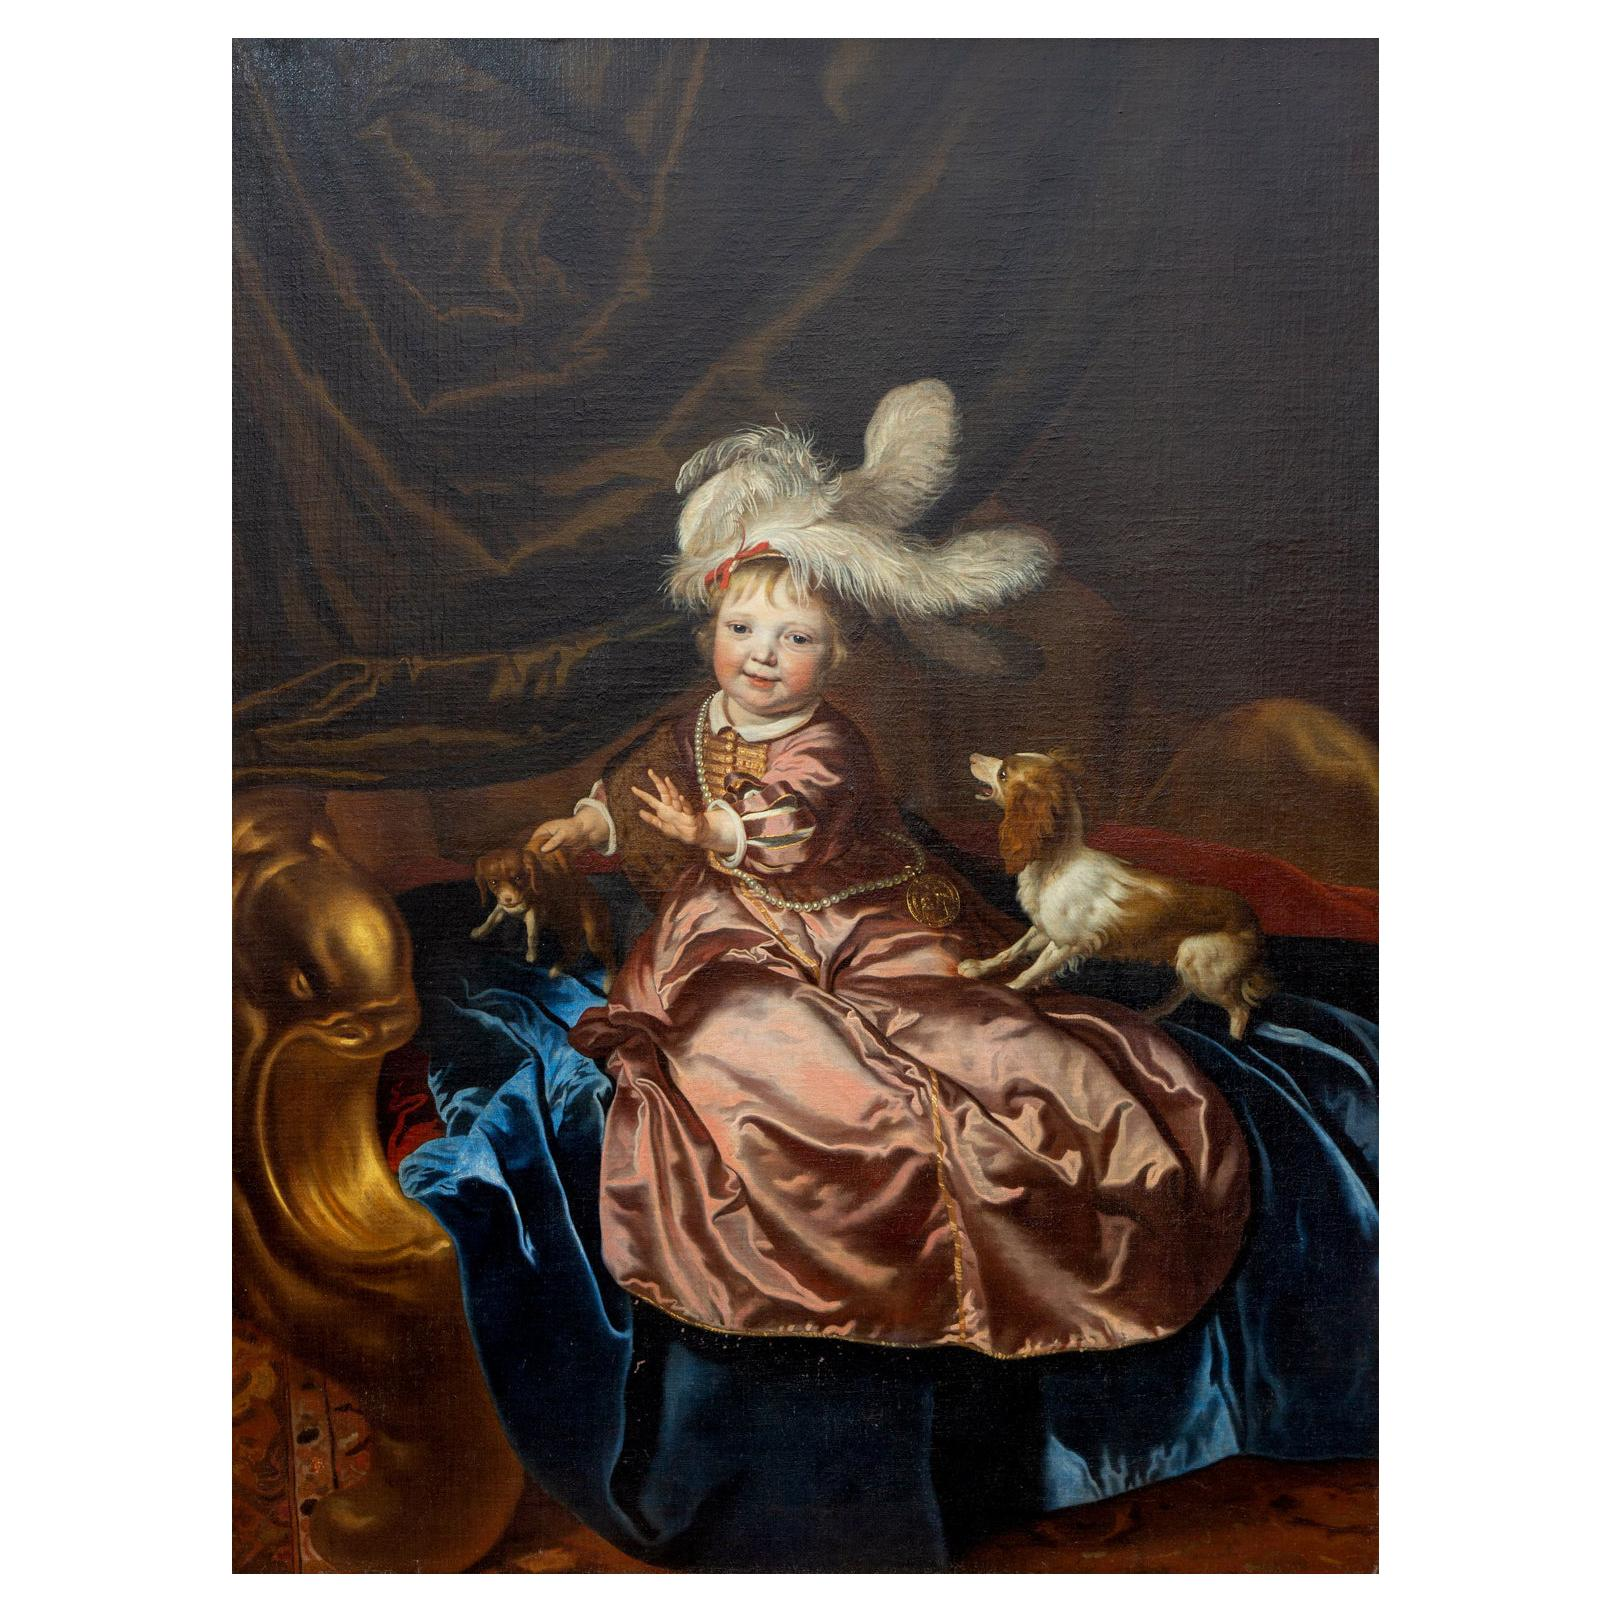 Large Portrait of a Boy, Jacob van Loo '1614-1670', Dutch Master Painting